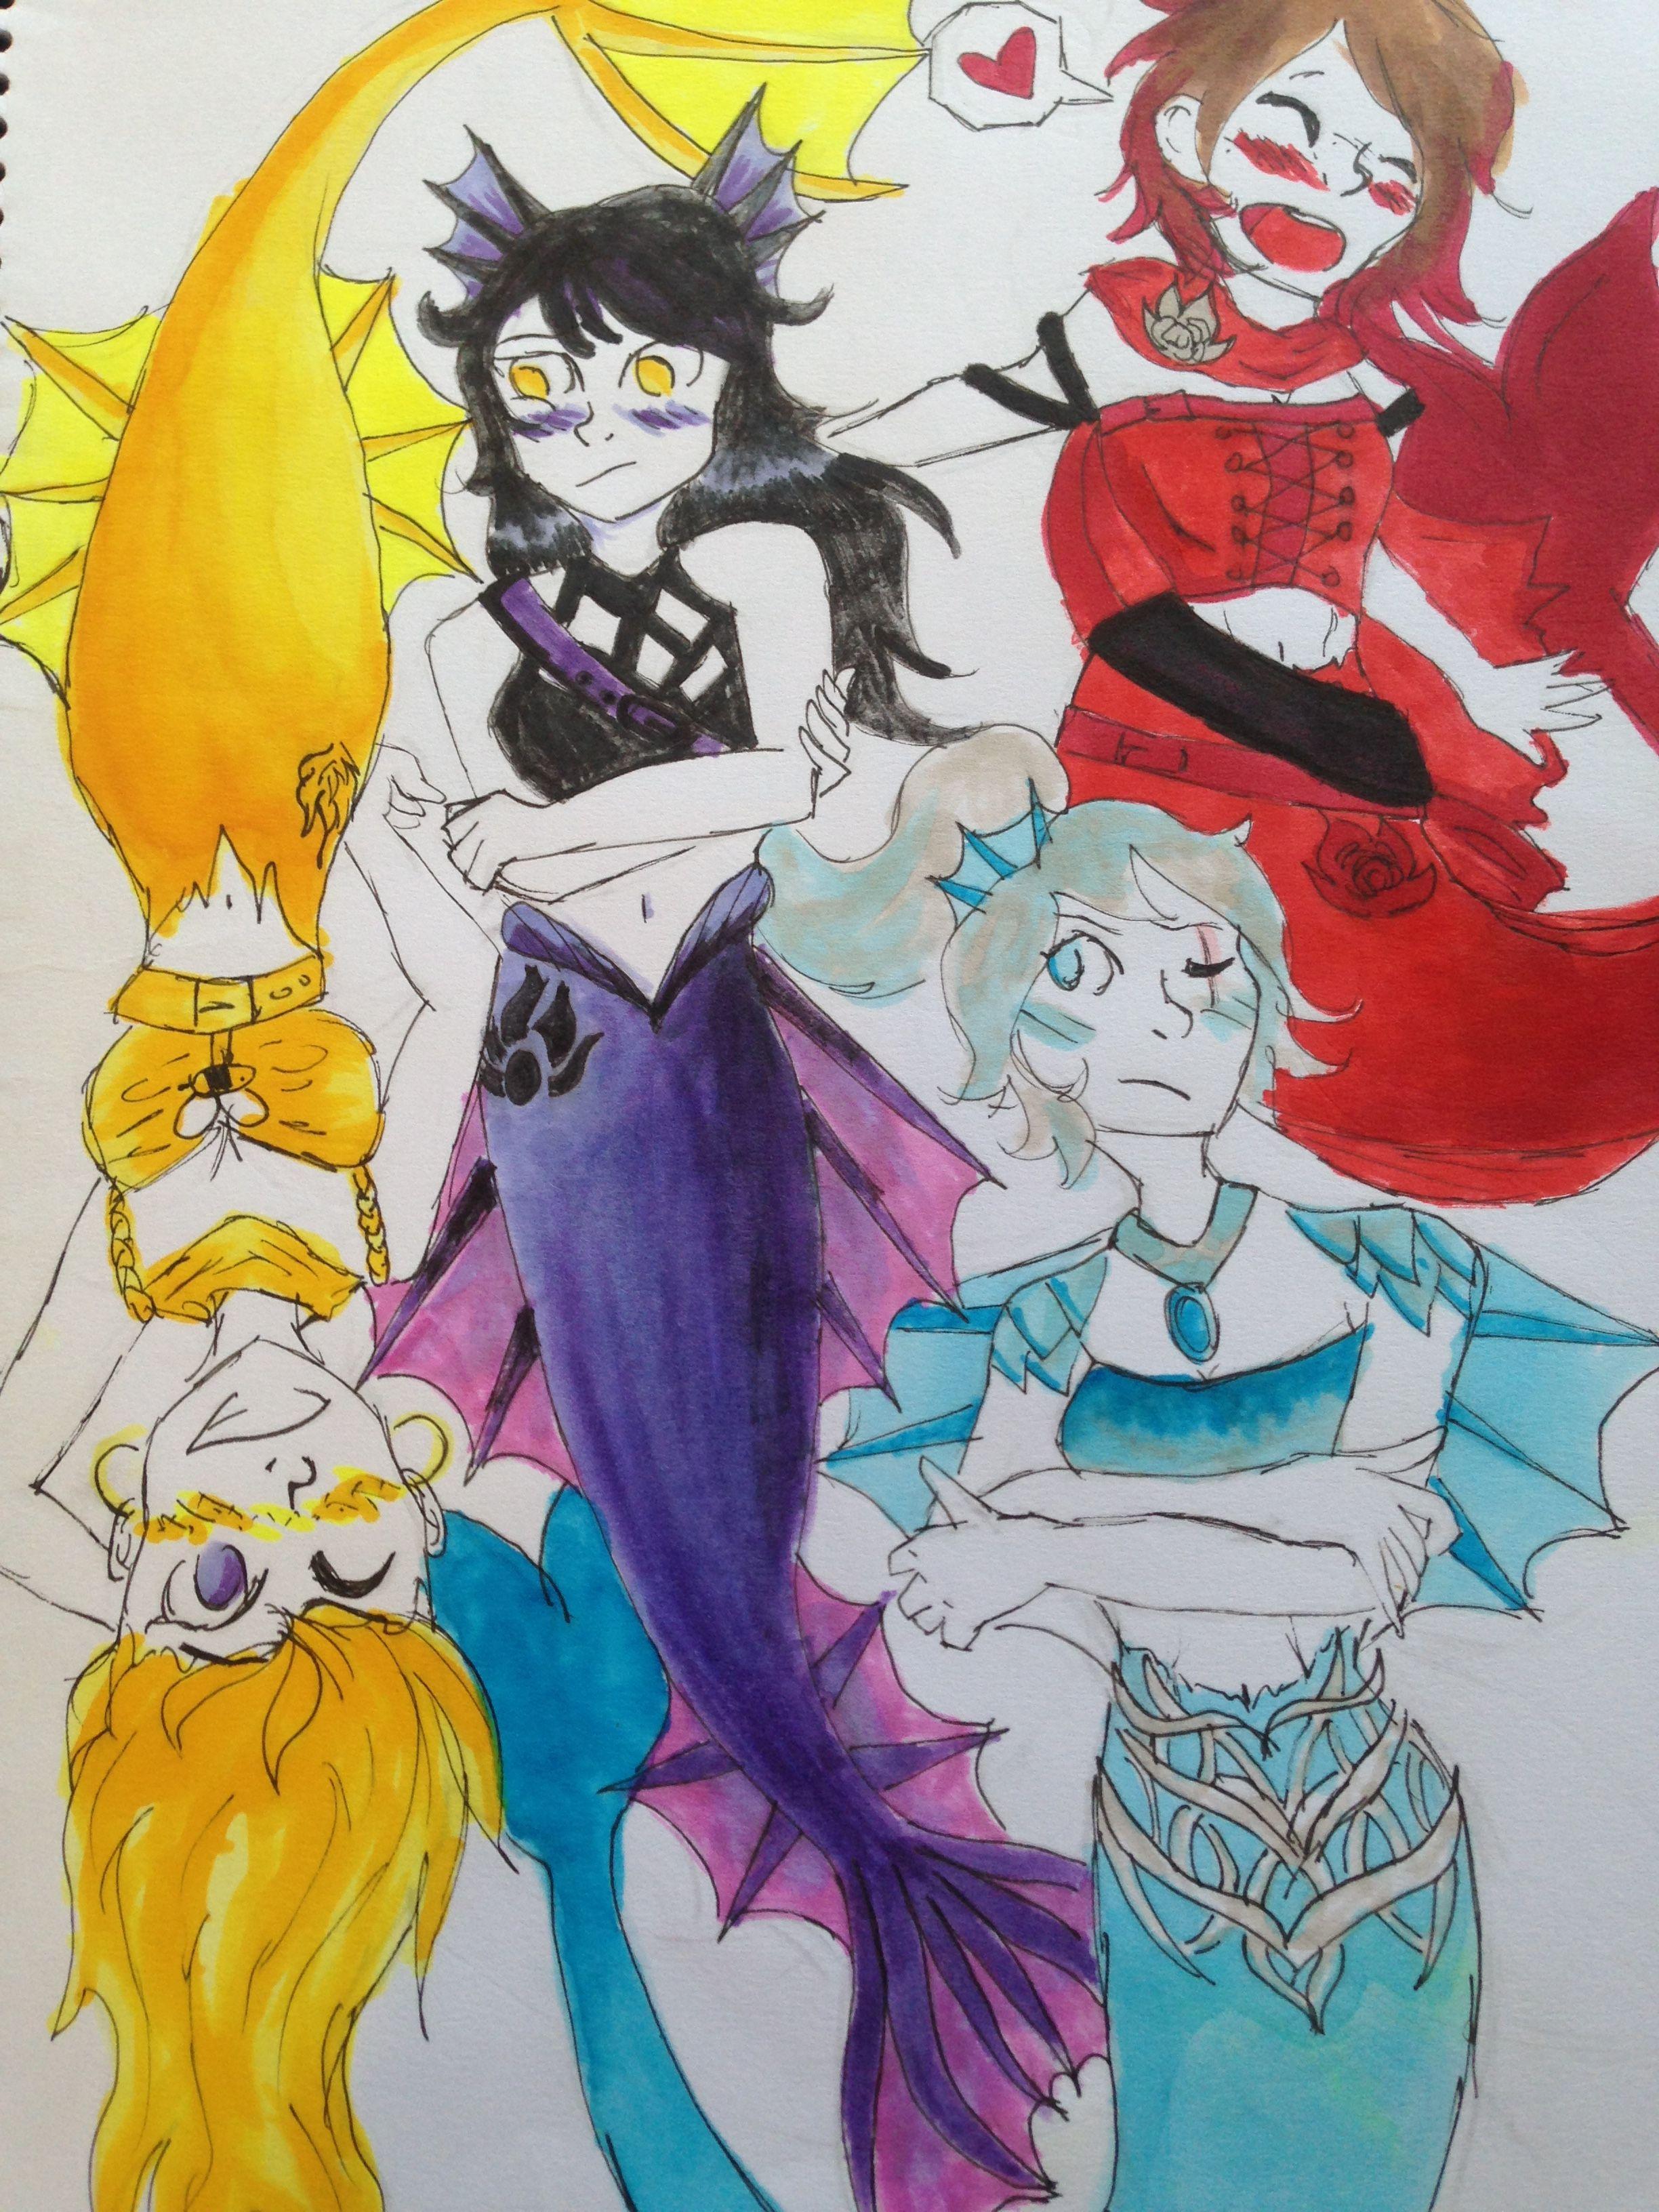 RWBY mermaid au | RWBY | Rwby, Mermaid, Princess zelda